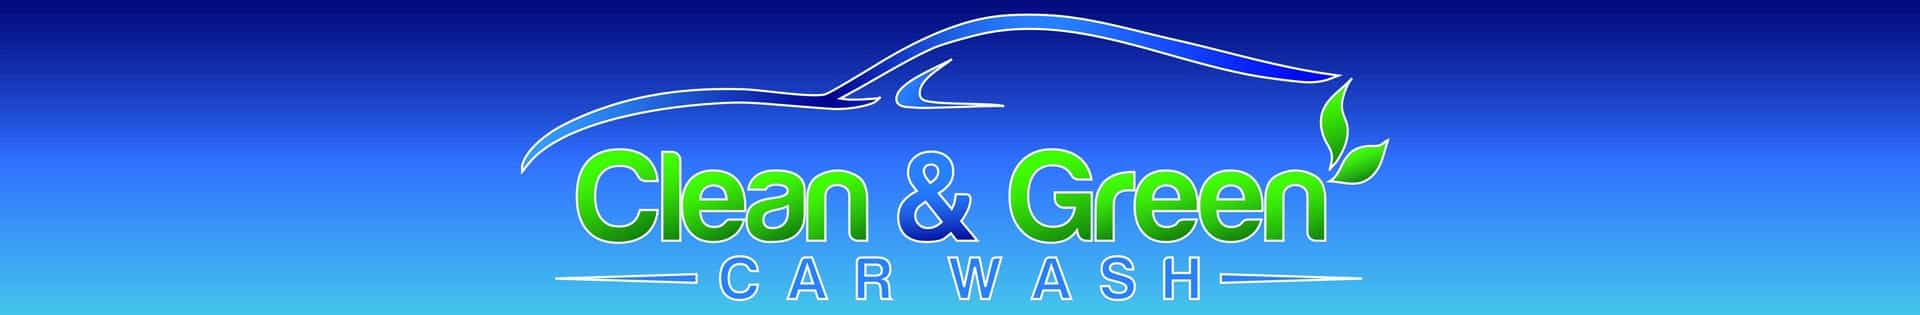 car wash signs Texas